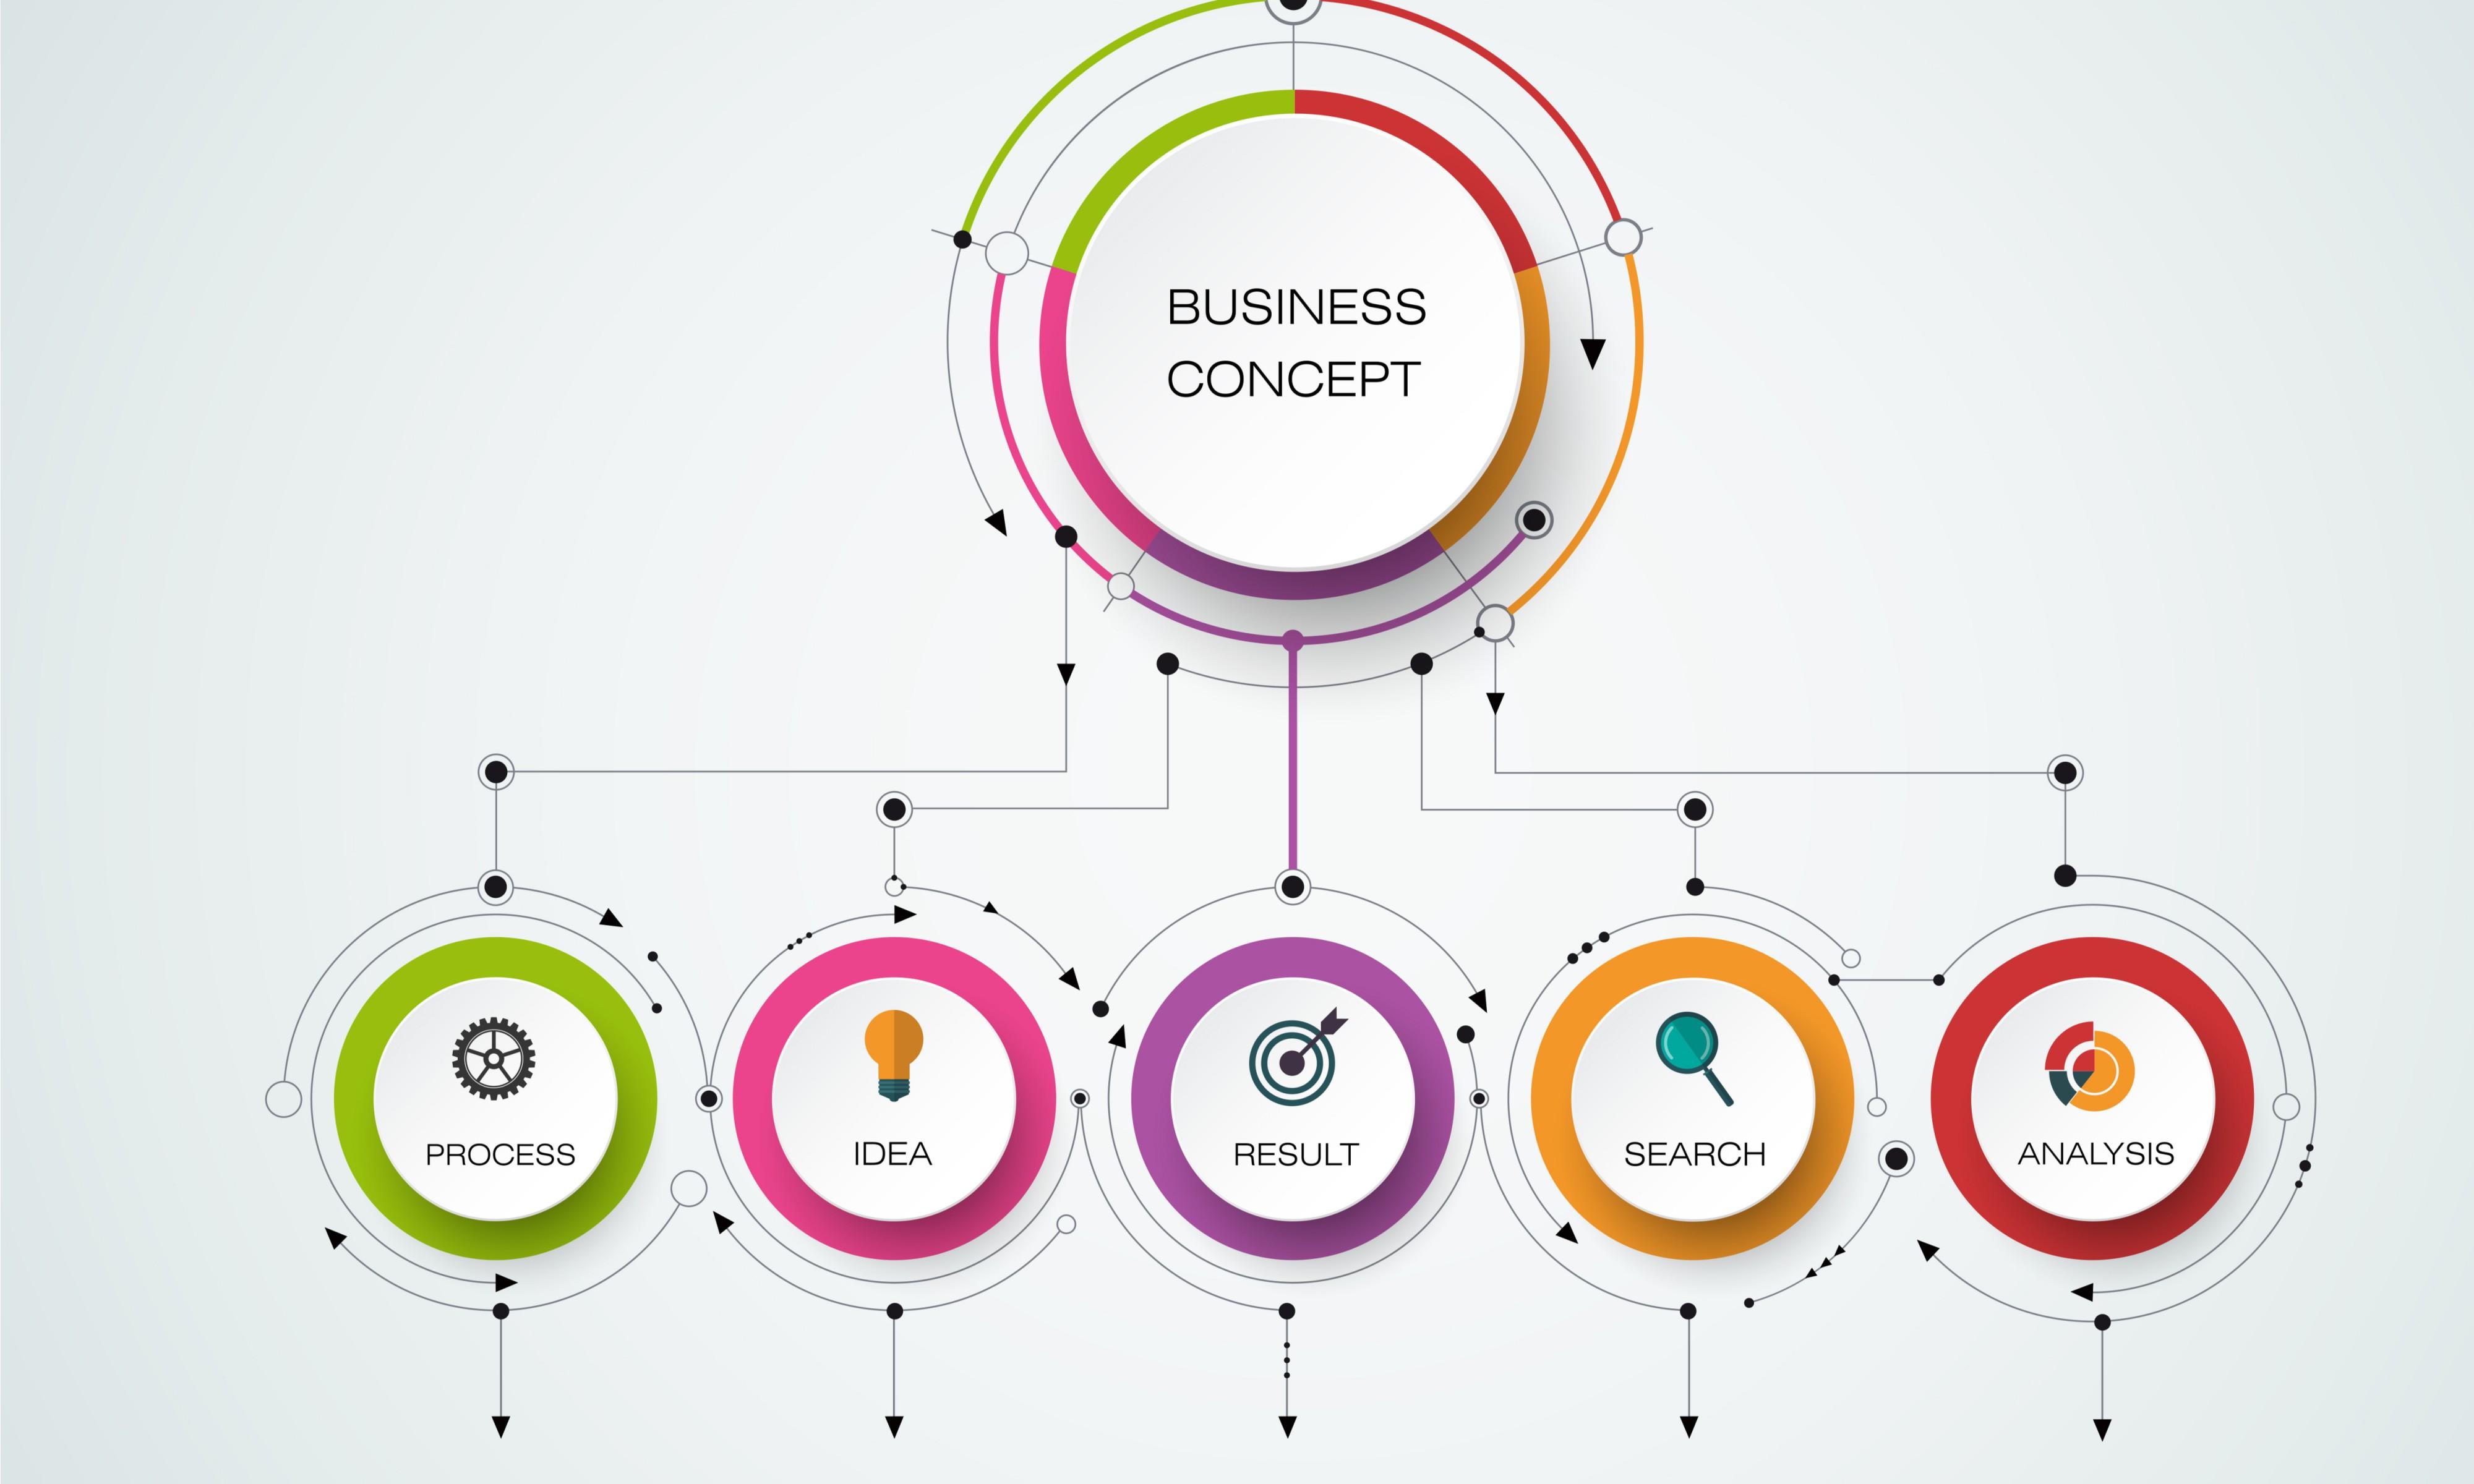 Azure Business Concept